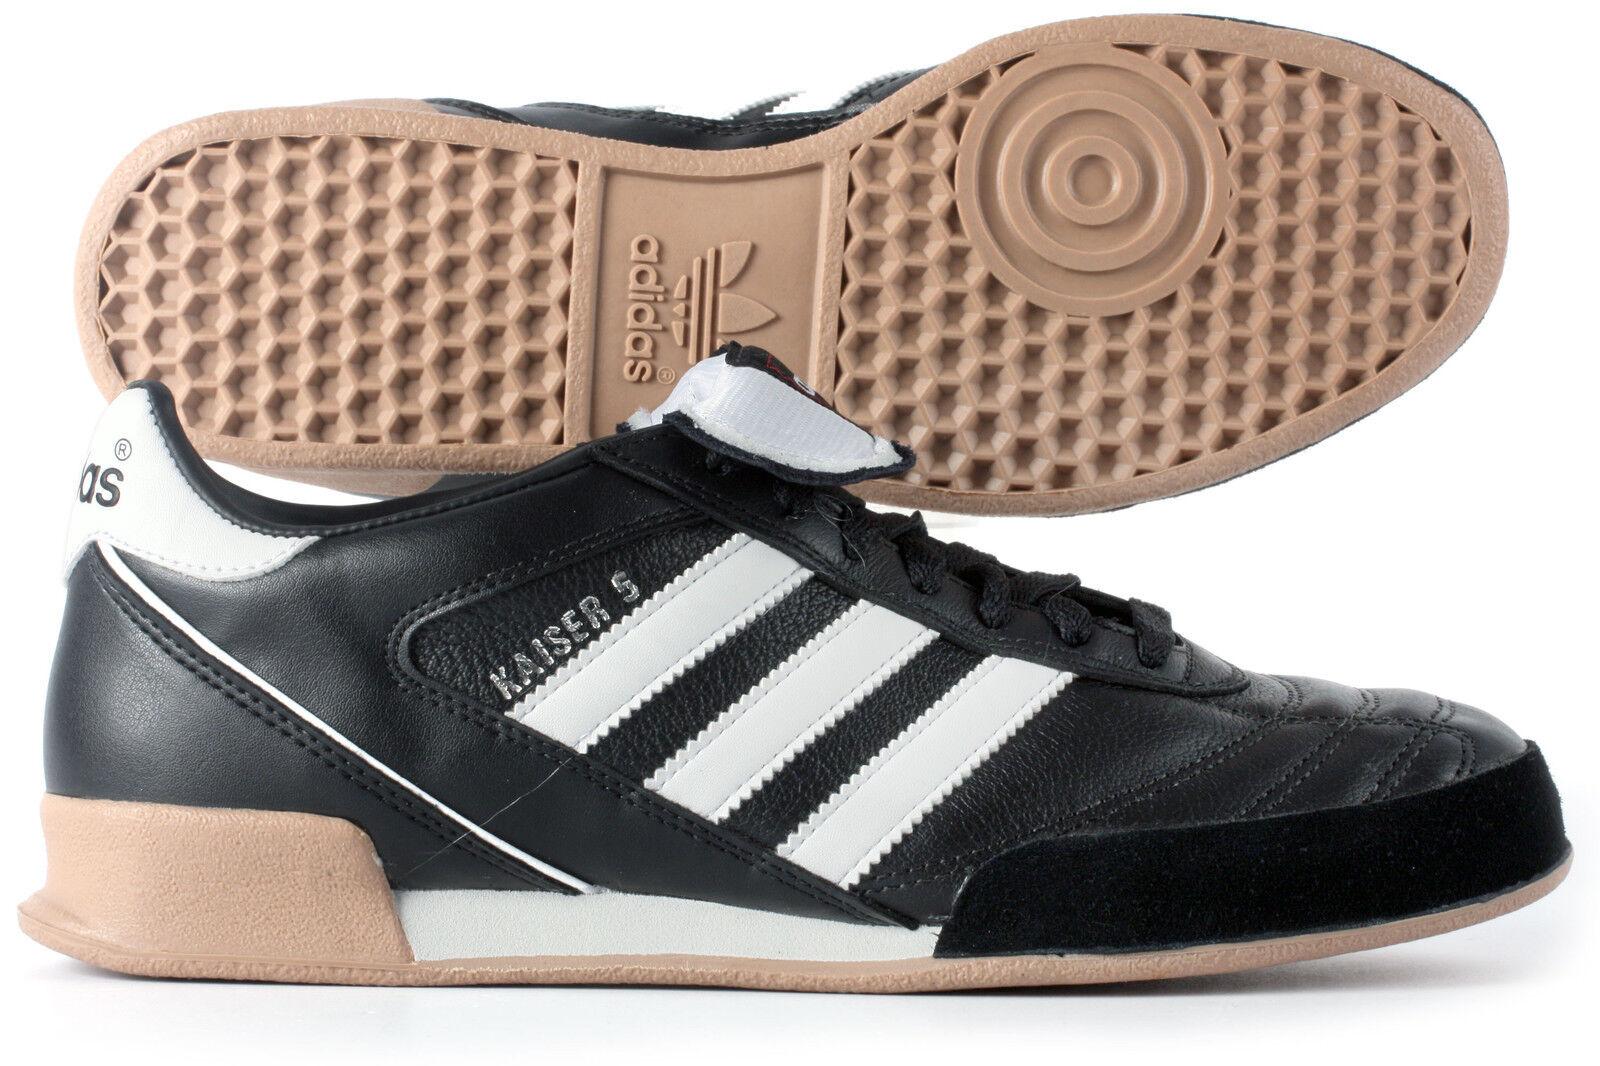 adidas Man Kaiser 5 Goal Indoor Football Bottes Studs Trainers Sports Shoes Noir